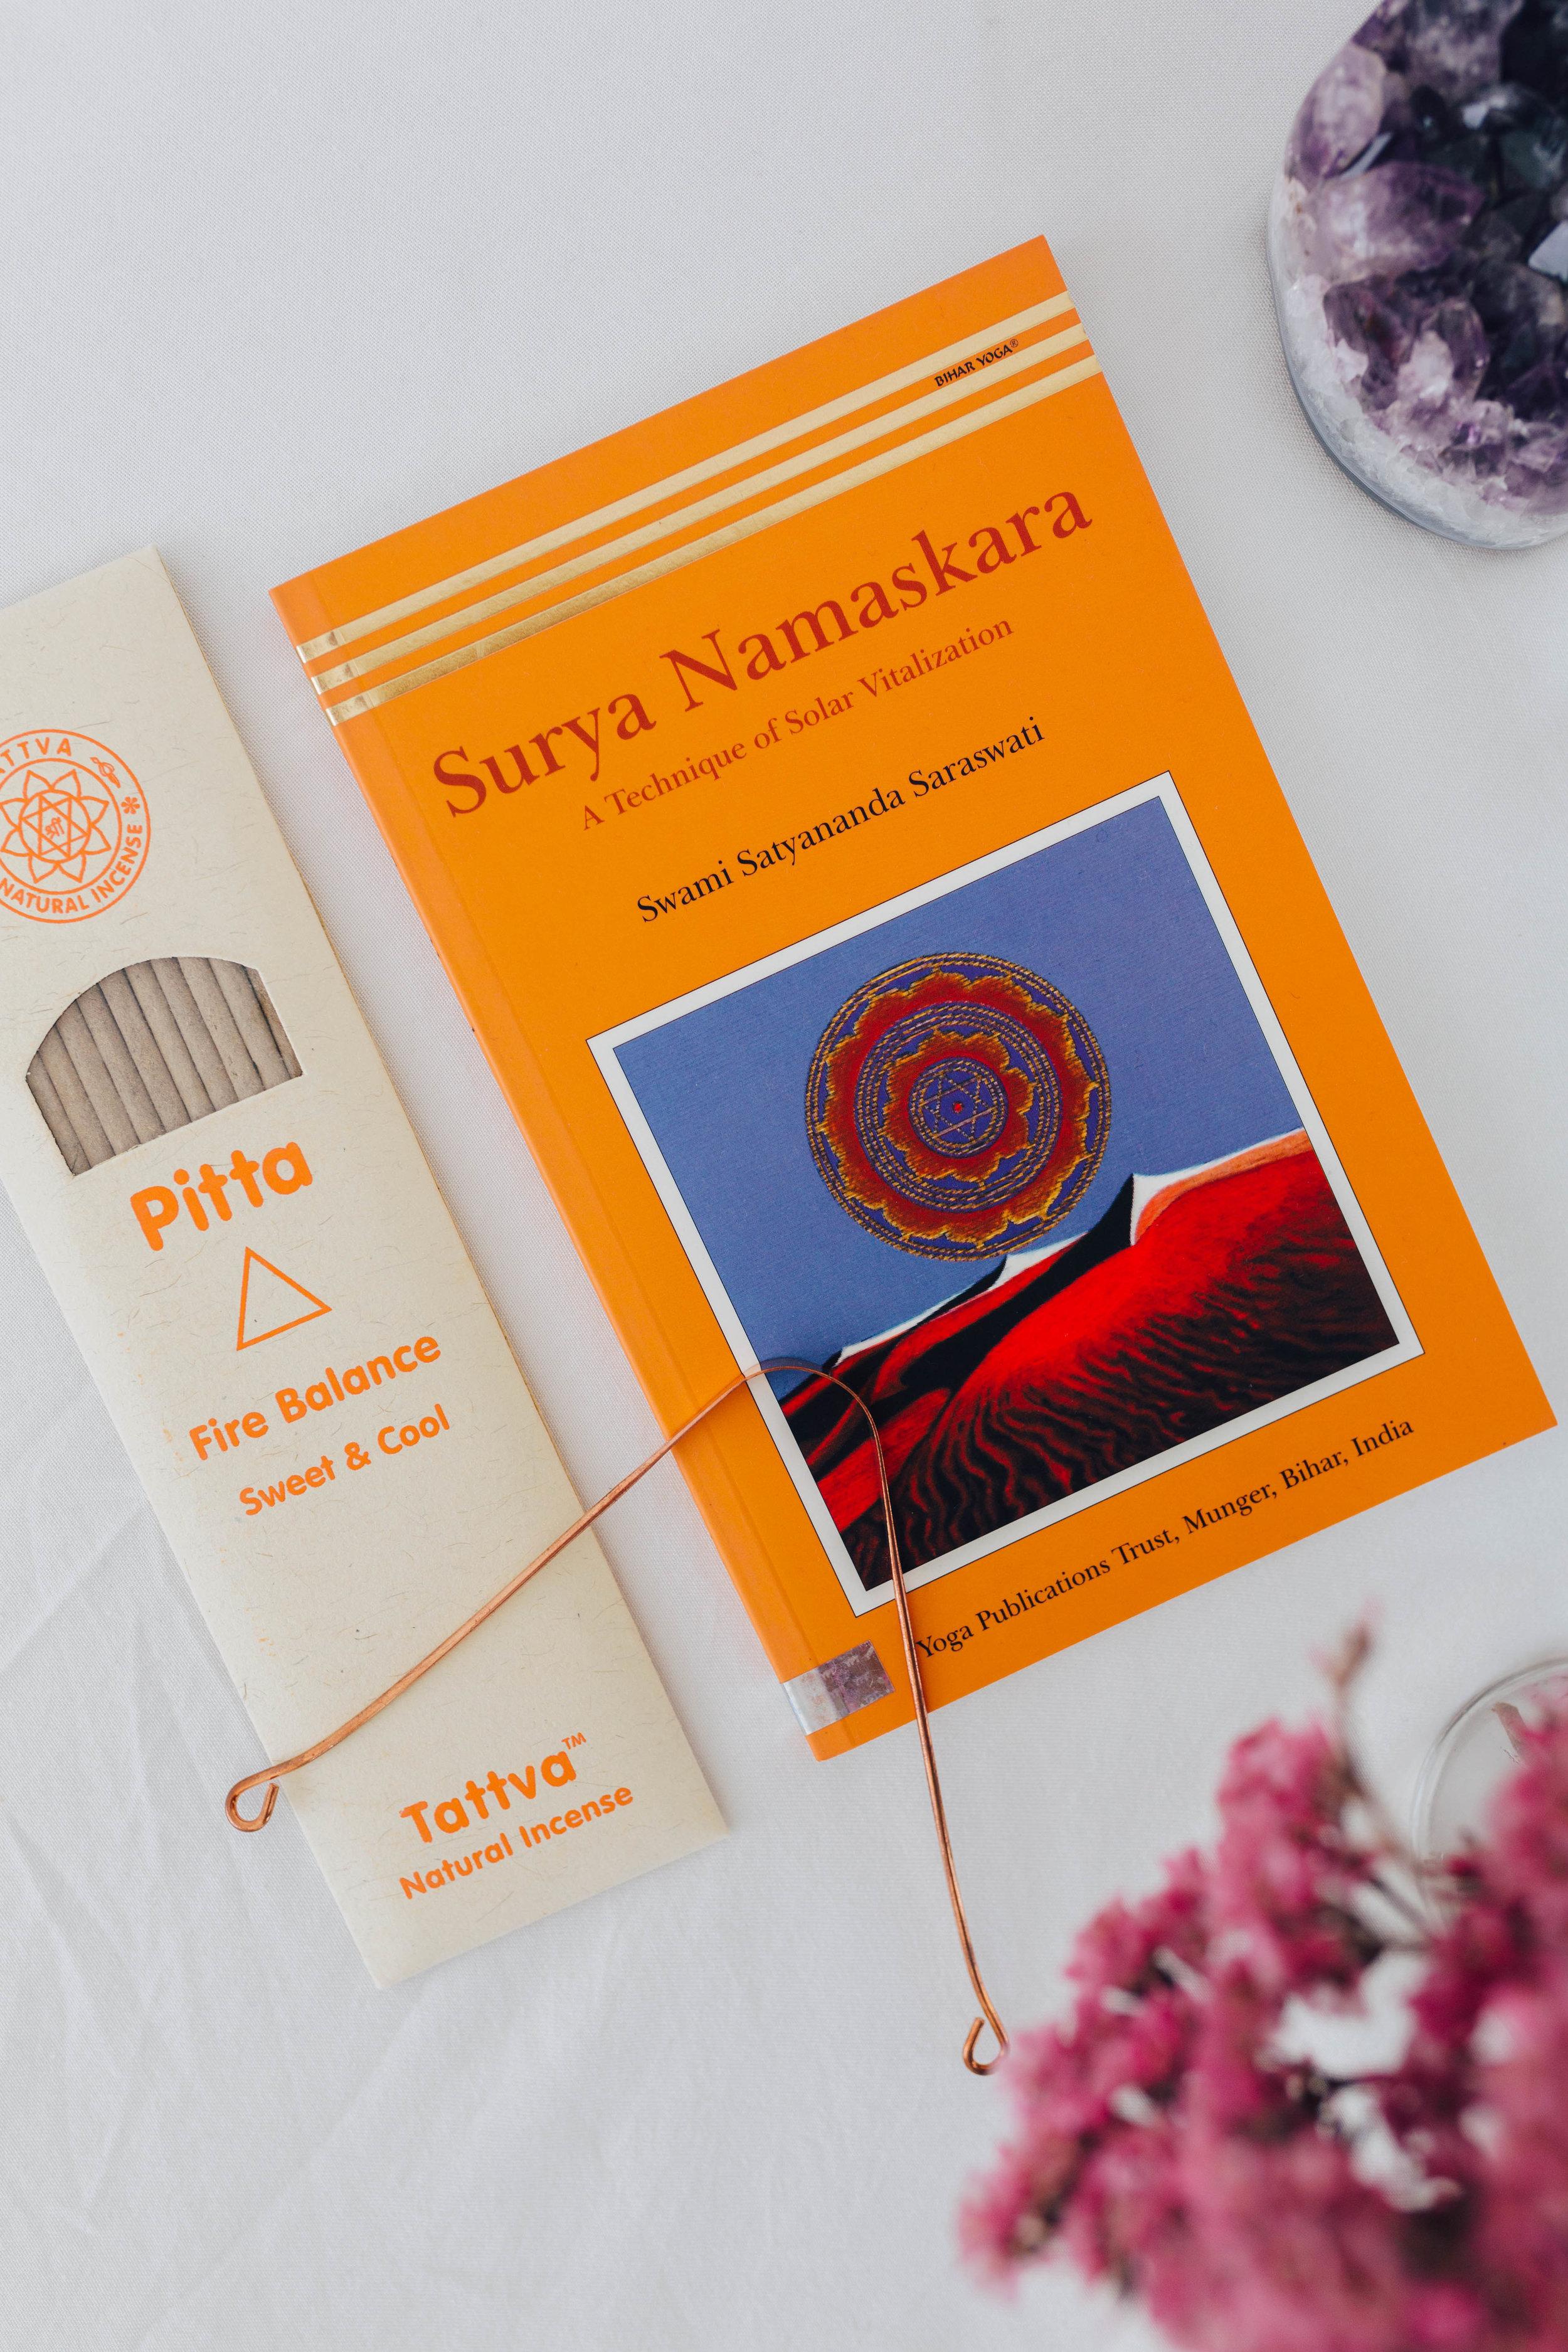 --- $25 gift ---- + 'Surya Namaskara' book - the art and science of Sun Salutations (an amazing book) + Pitta incense + Copper Tongue Scraper